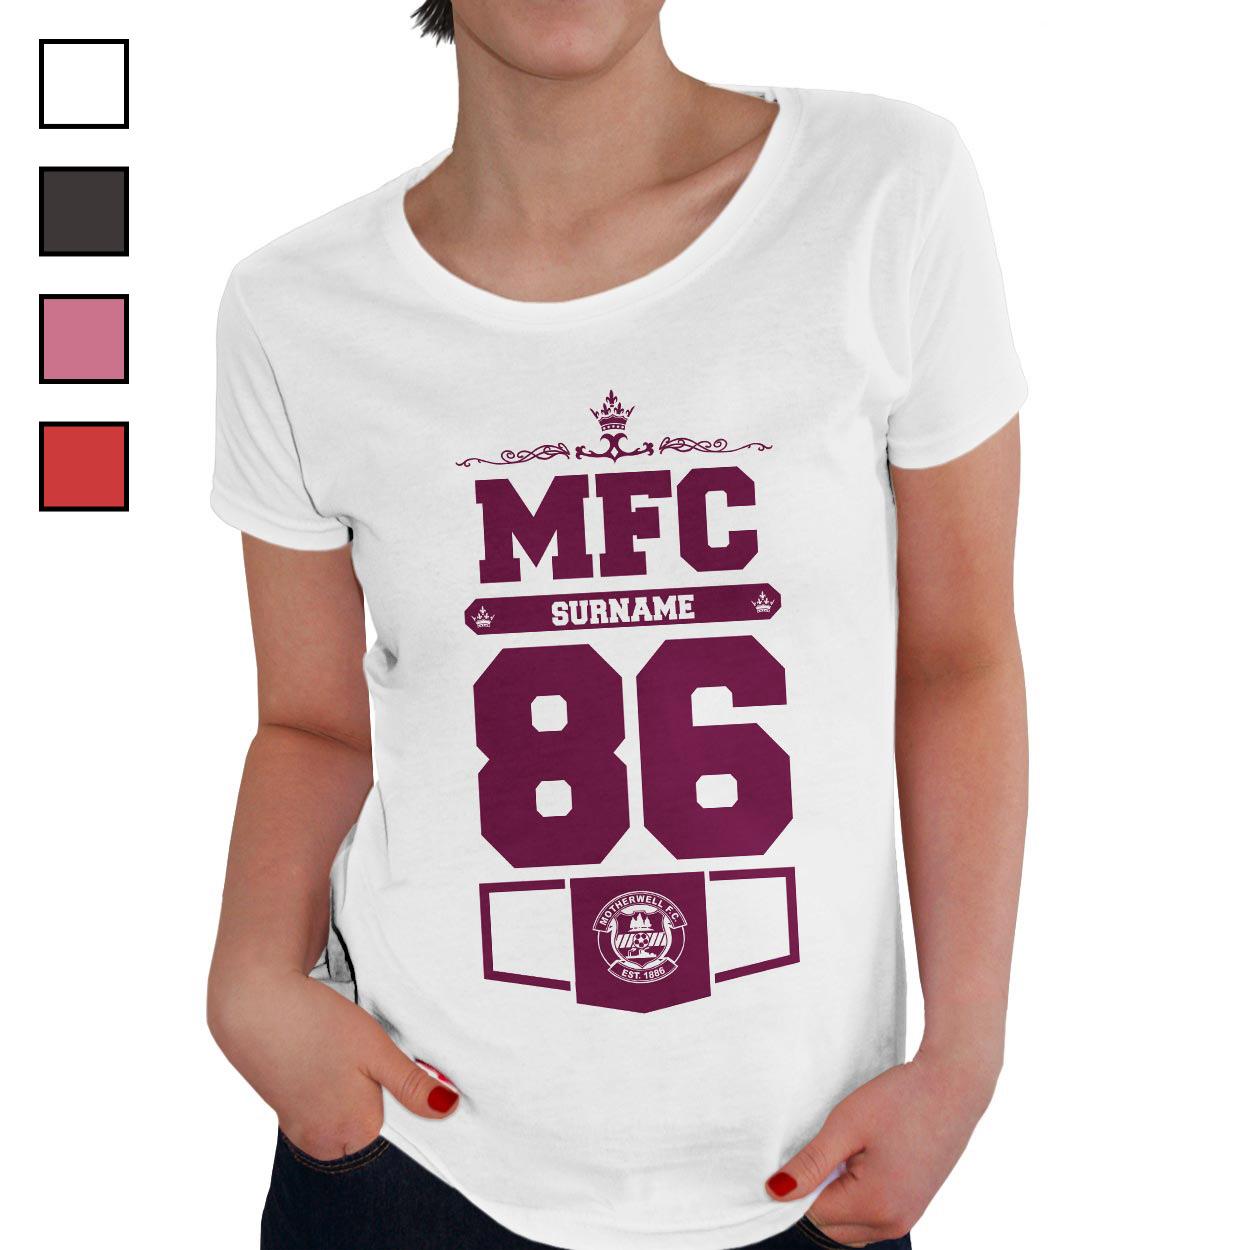 Motherwell FC Ladies Club T-Shirt